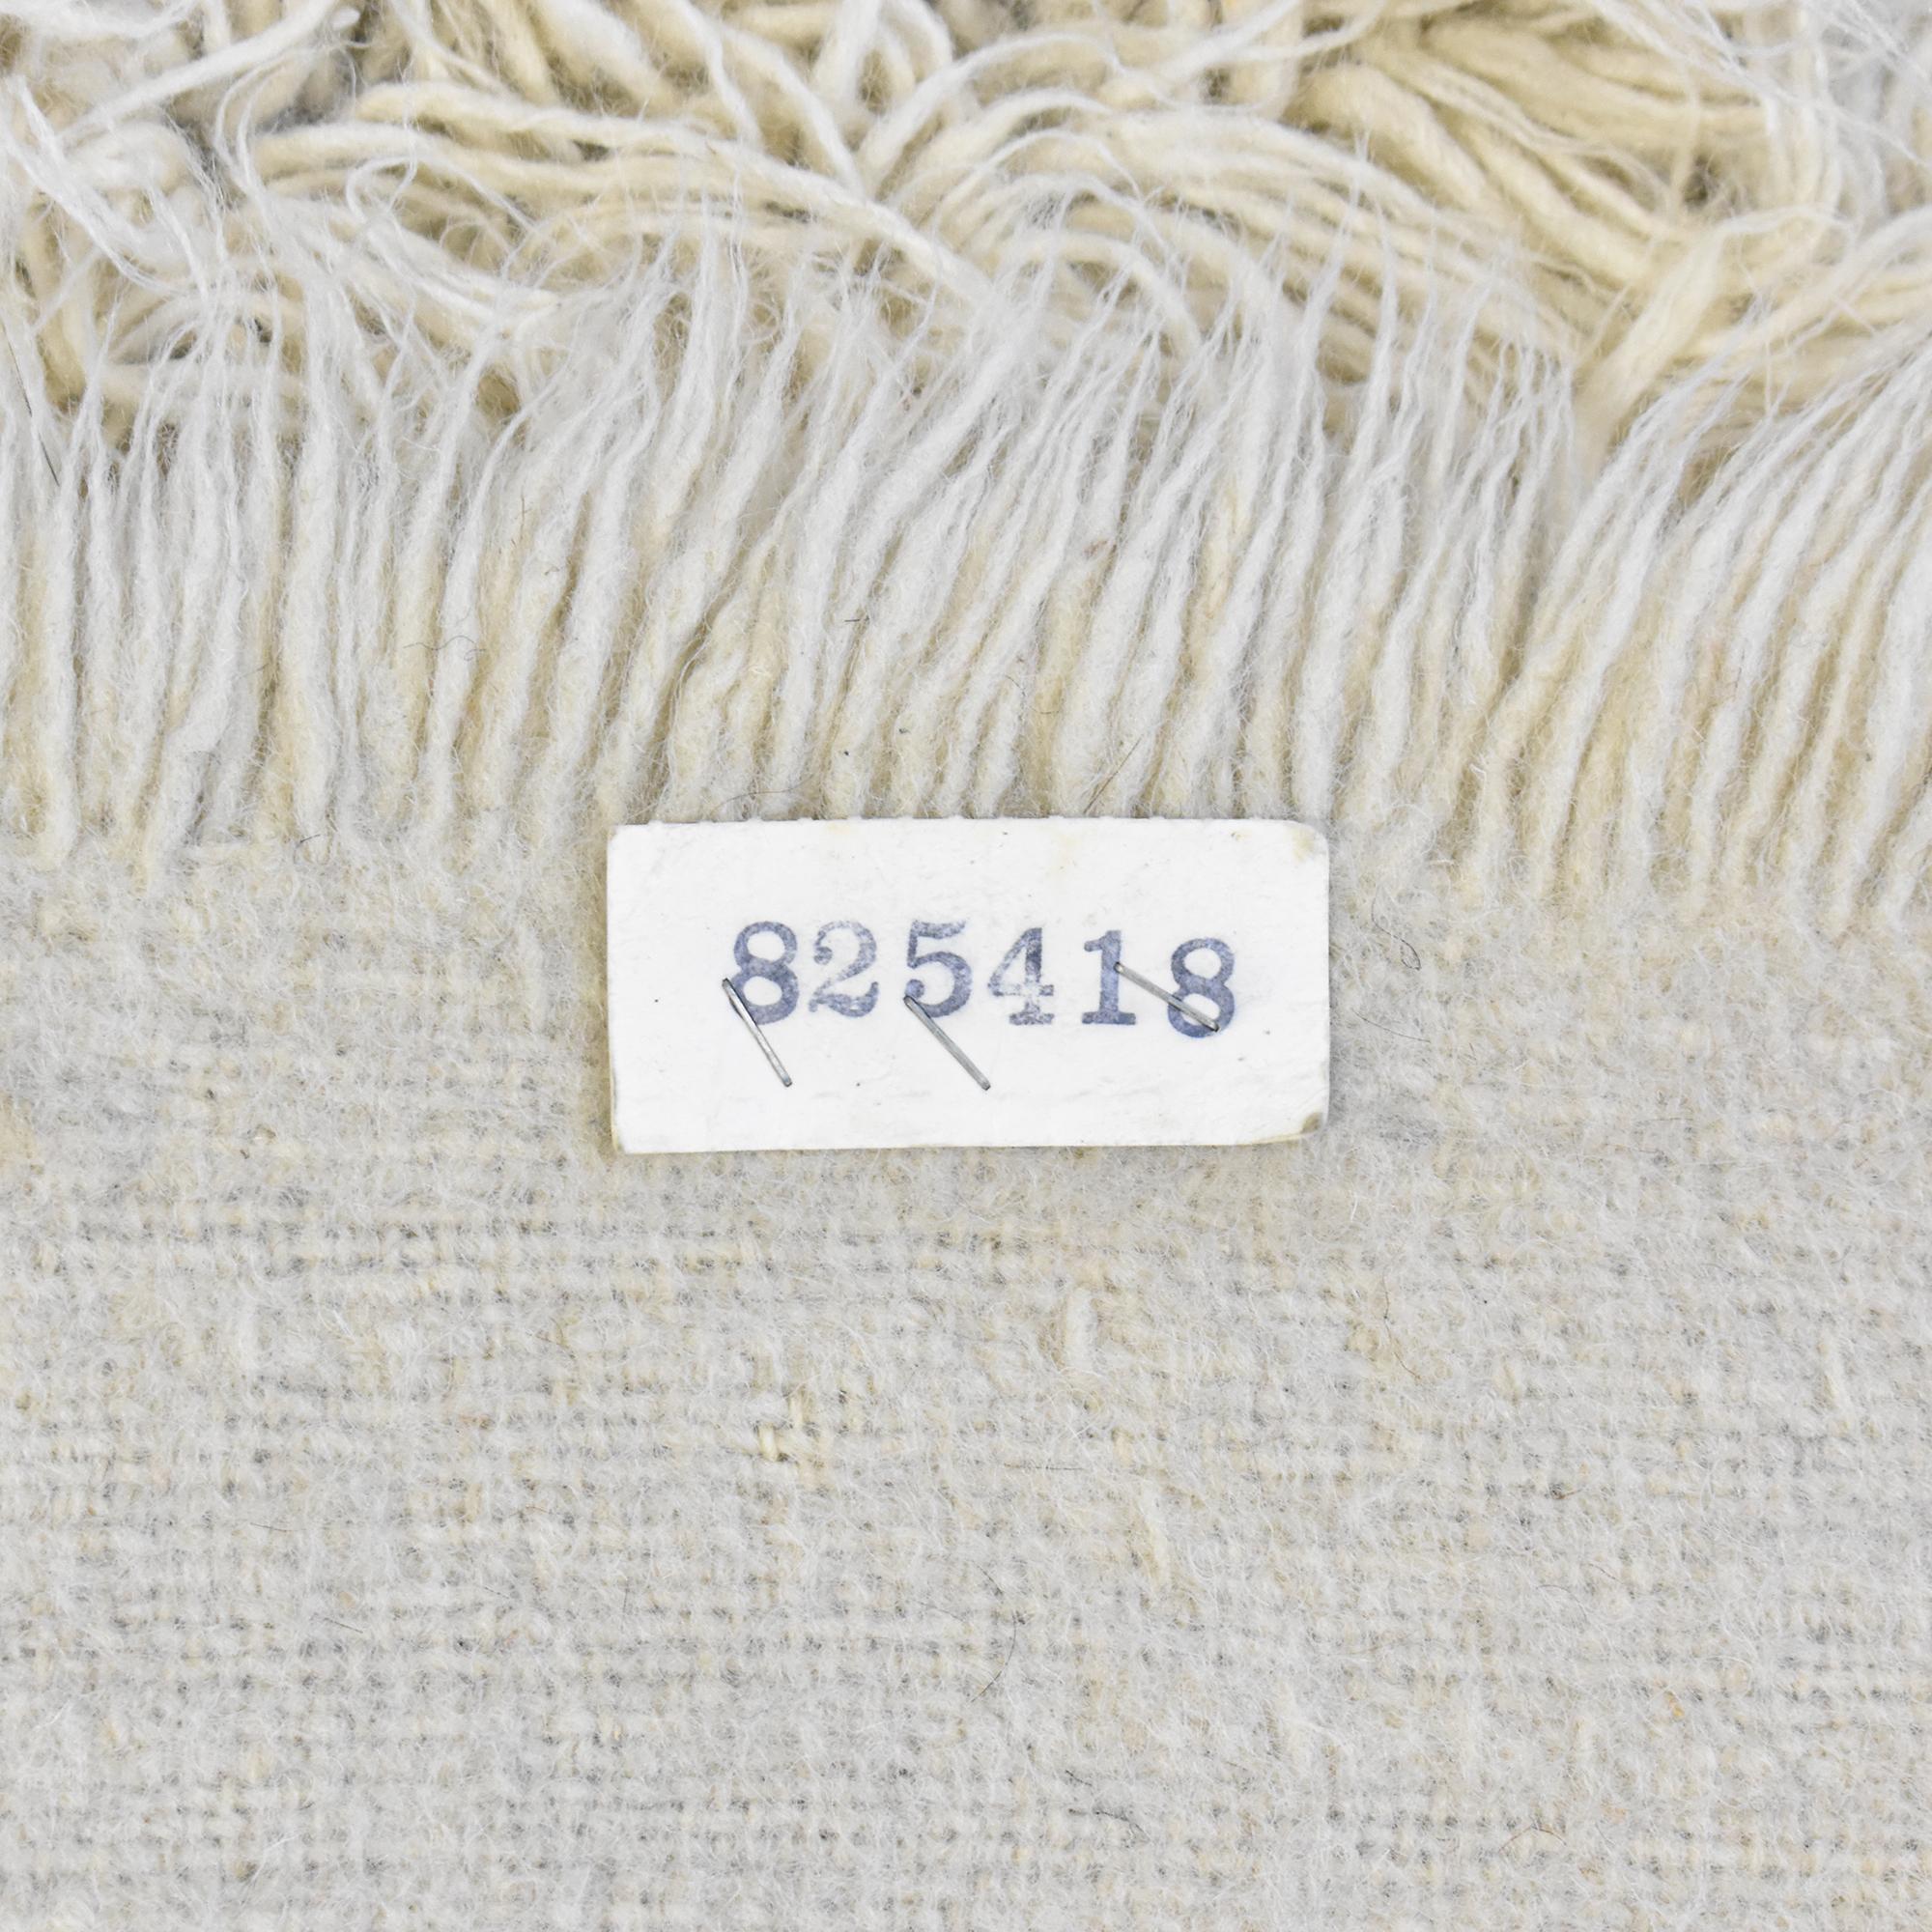 shop ABC Carpet & Home ABC Carpet & Home Shag Area Rug online